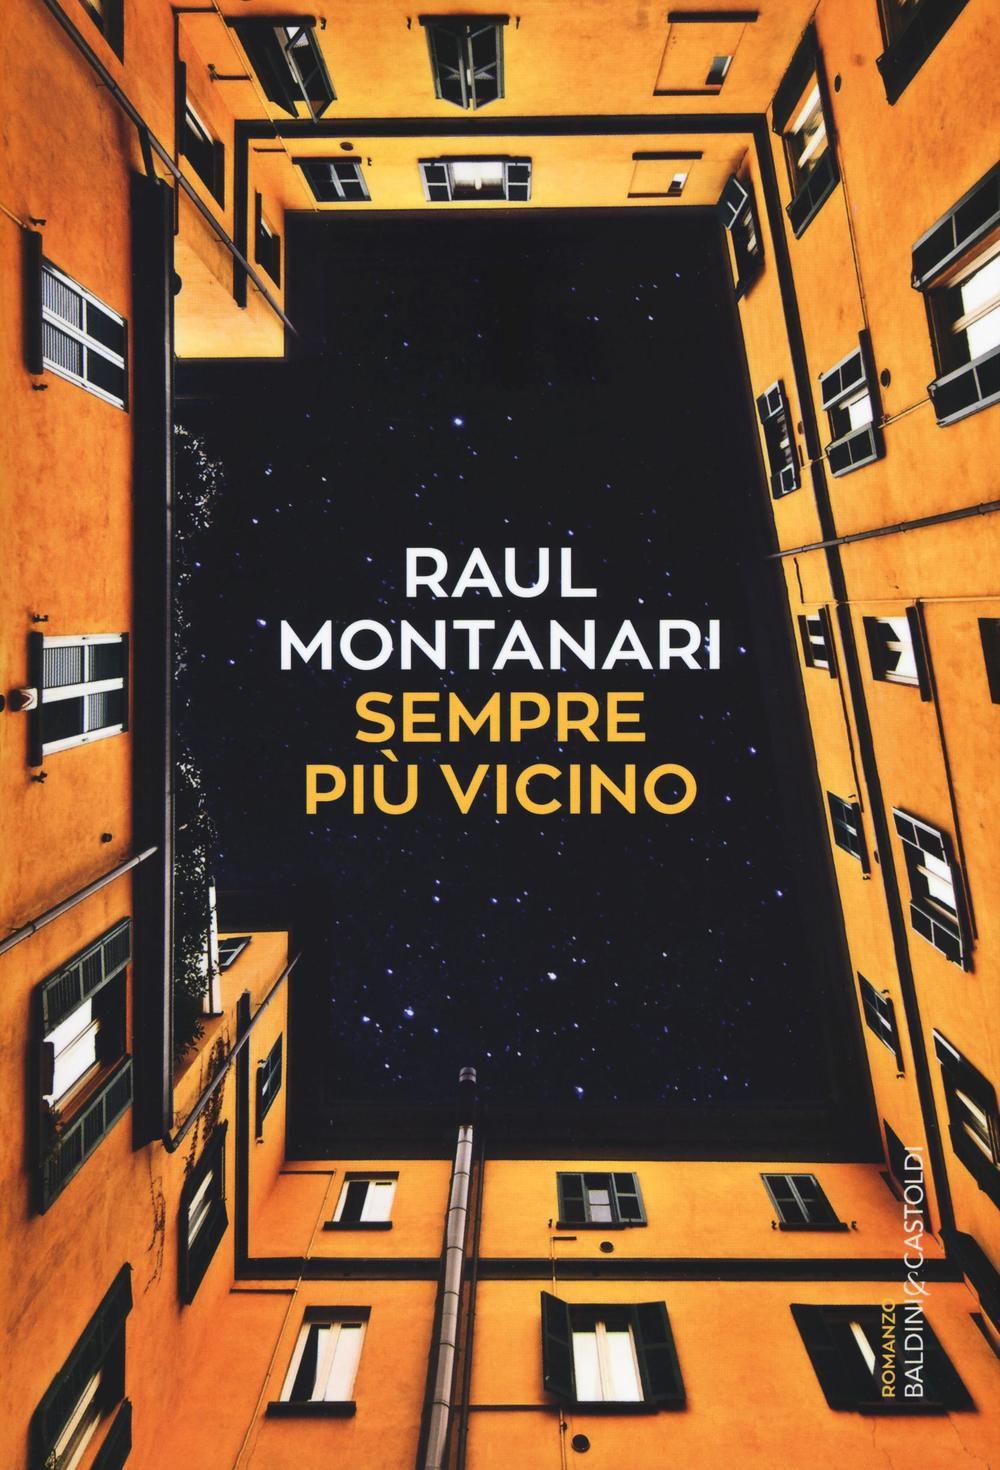 Raul Montanari